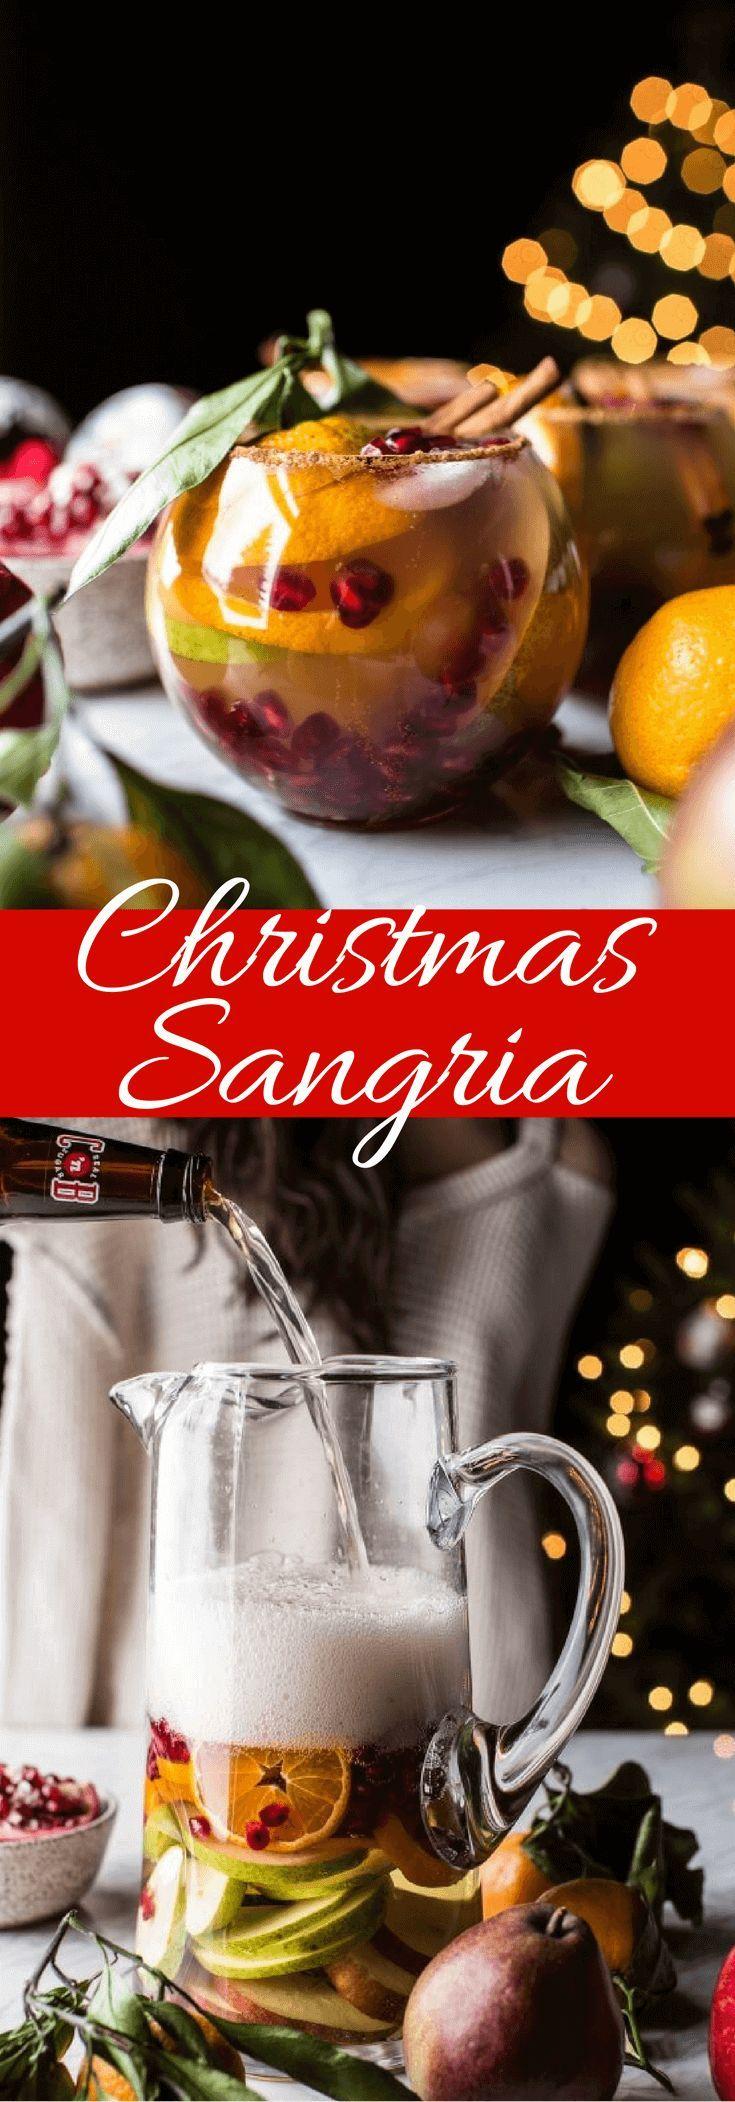 Christmas Sangria | http://halfbakedharvest.com /hbharvest/